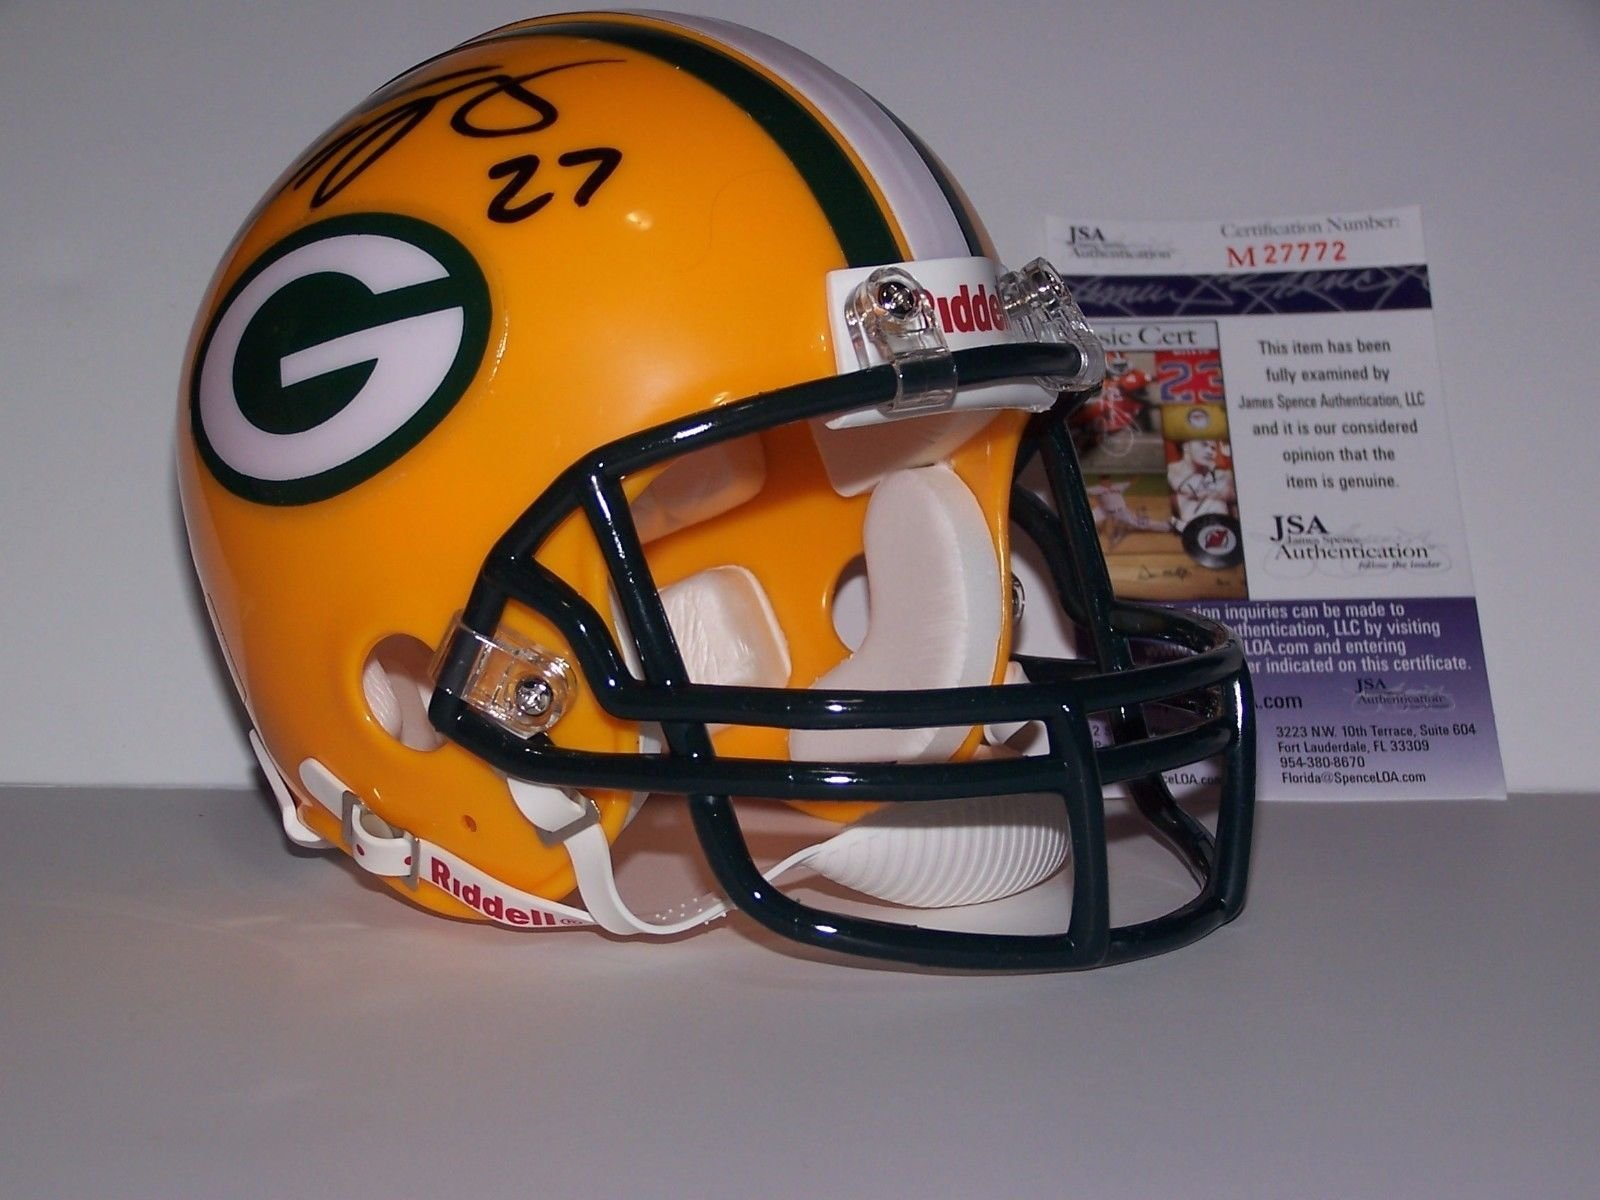 Eddie Lacy Autographed Signed Green Bay Packers Mini Helmet JSA Certified Ticket